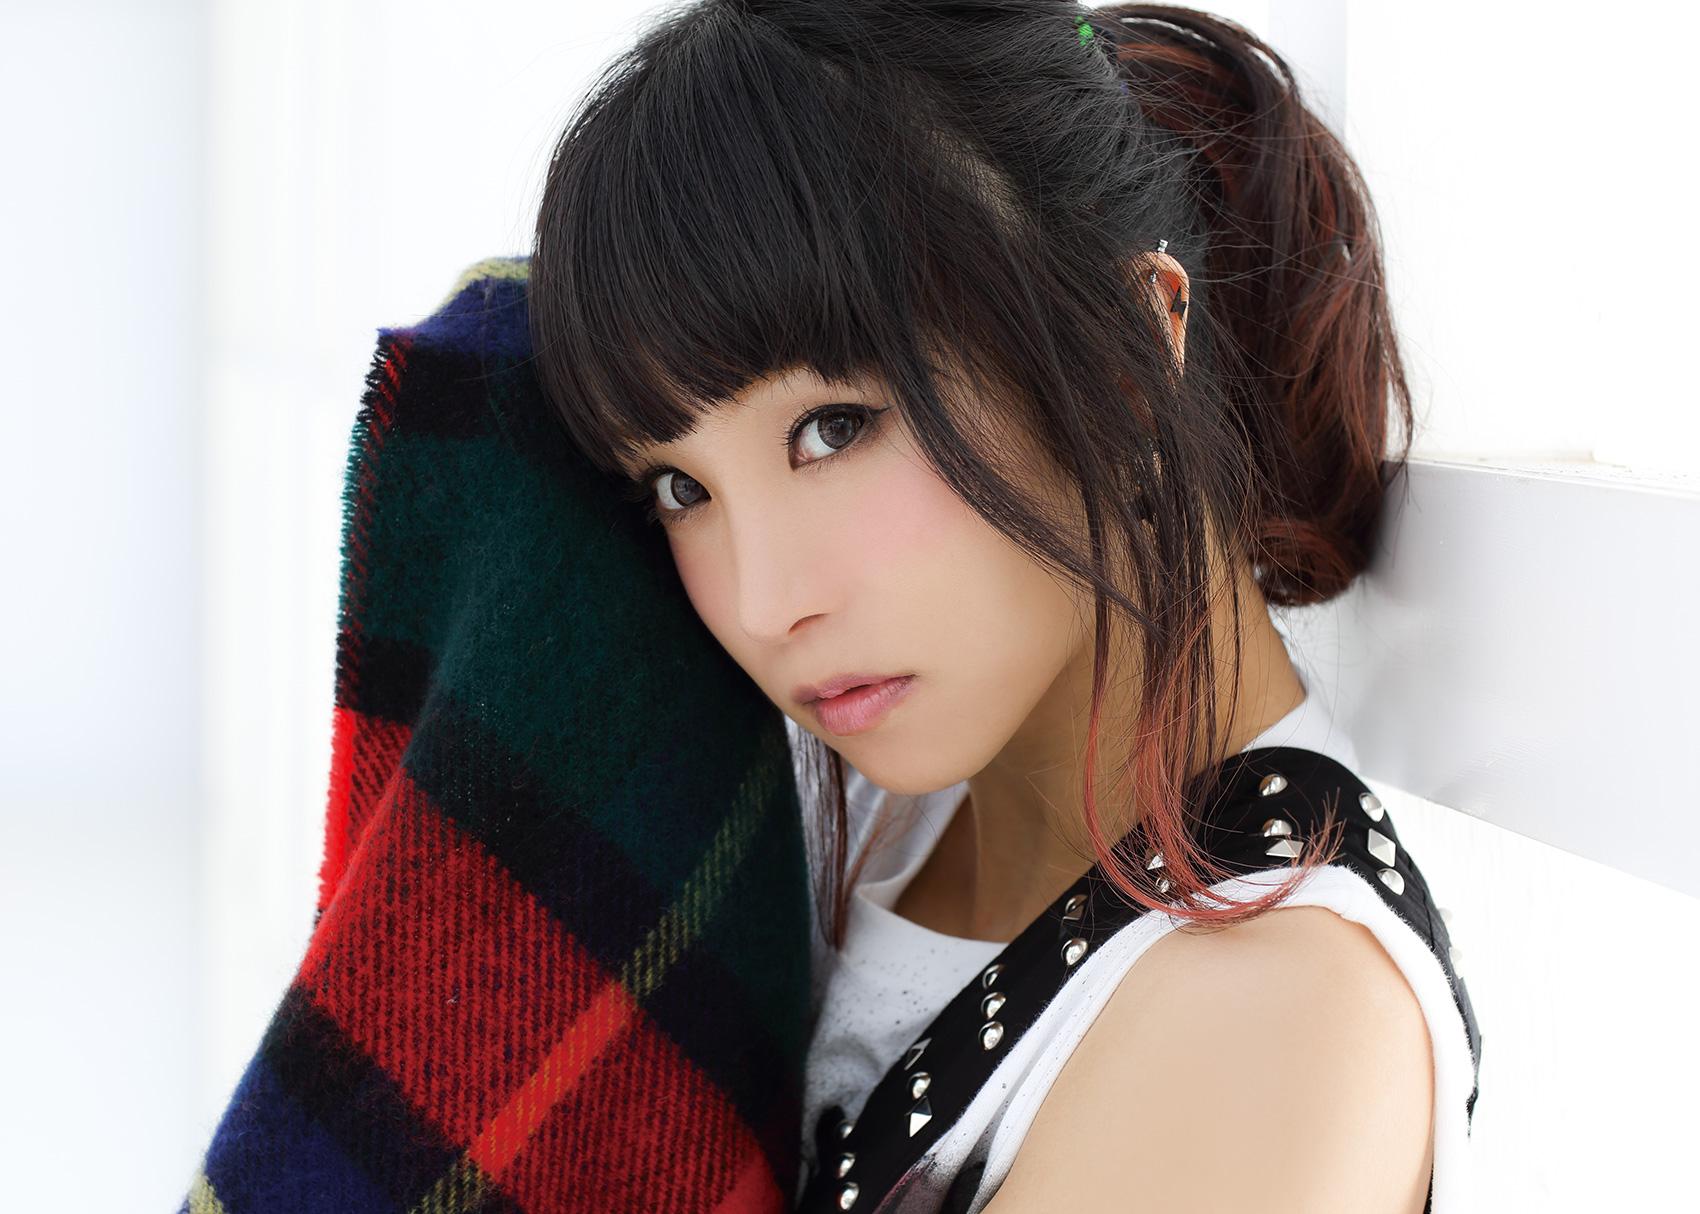 LiSA - Vocaloid Database